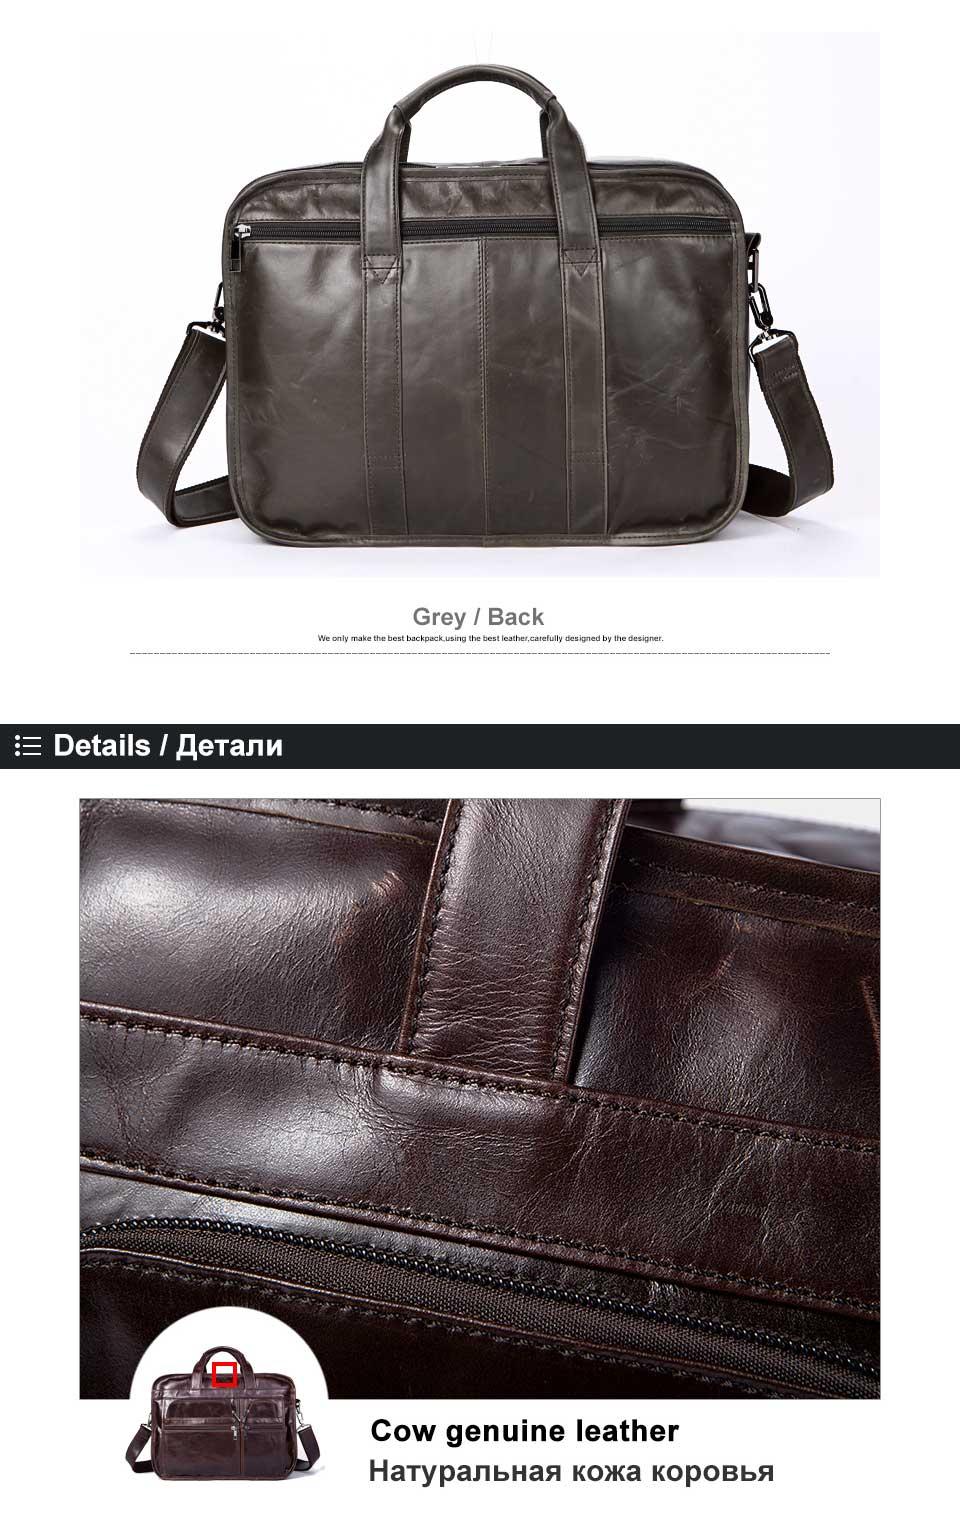 HTB1F7W.g3DD8KJjy0Fdq6AjvXXac WESTAL men's genuine leather bag for men's briefcase office bags for men leather laptop bag document business briefcase handbag